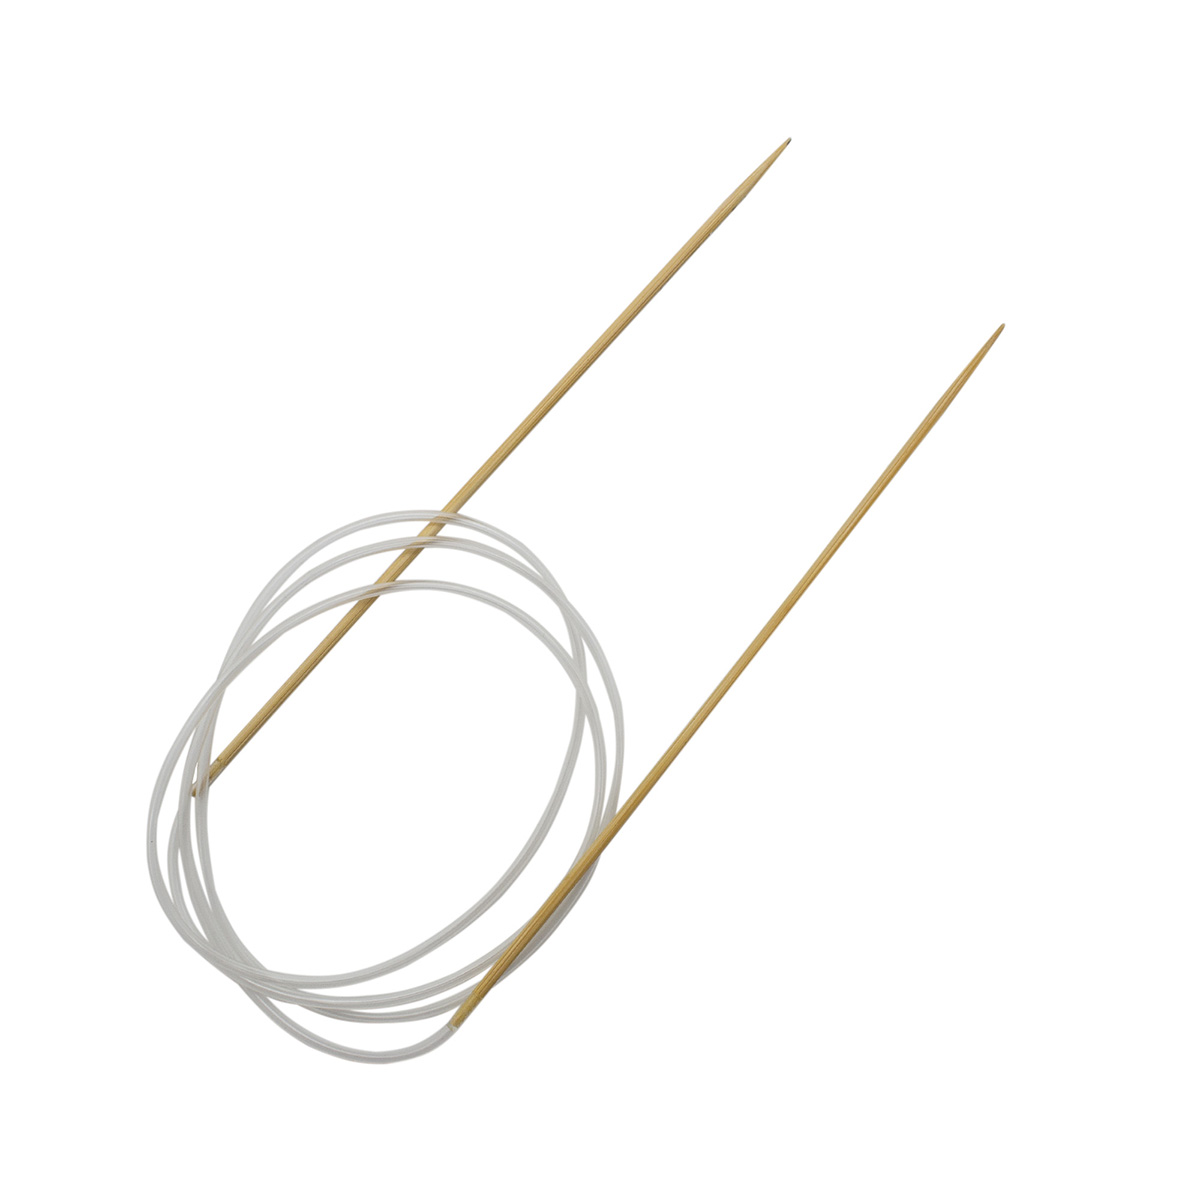 Спицы круговые бамбук 942120, 100 см, 2,0 мм, Hobby&Pro